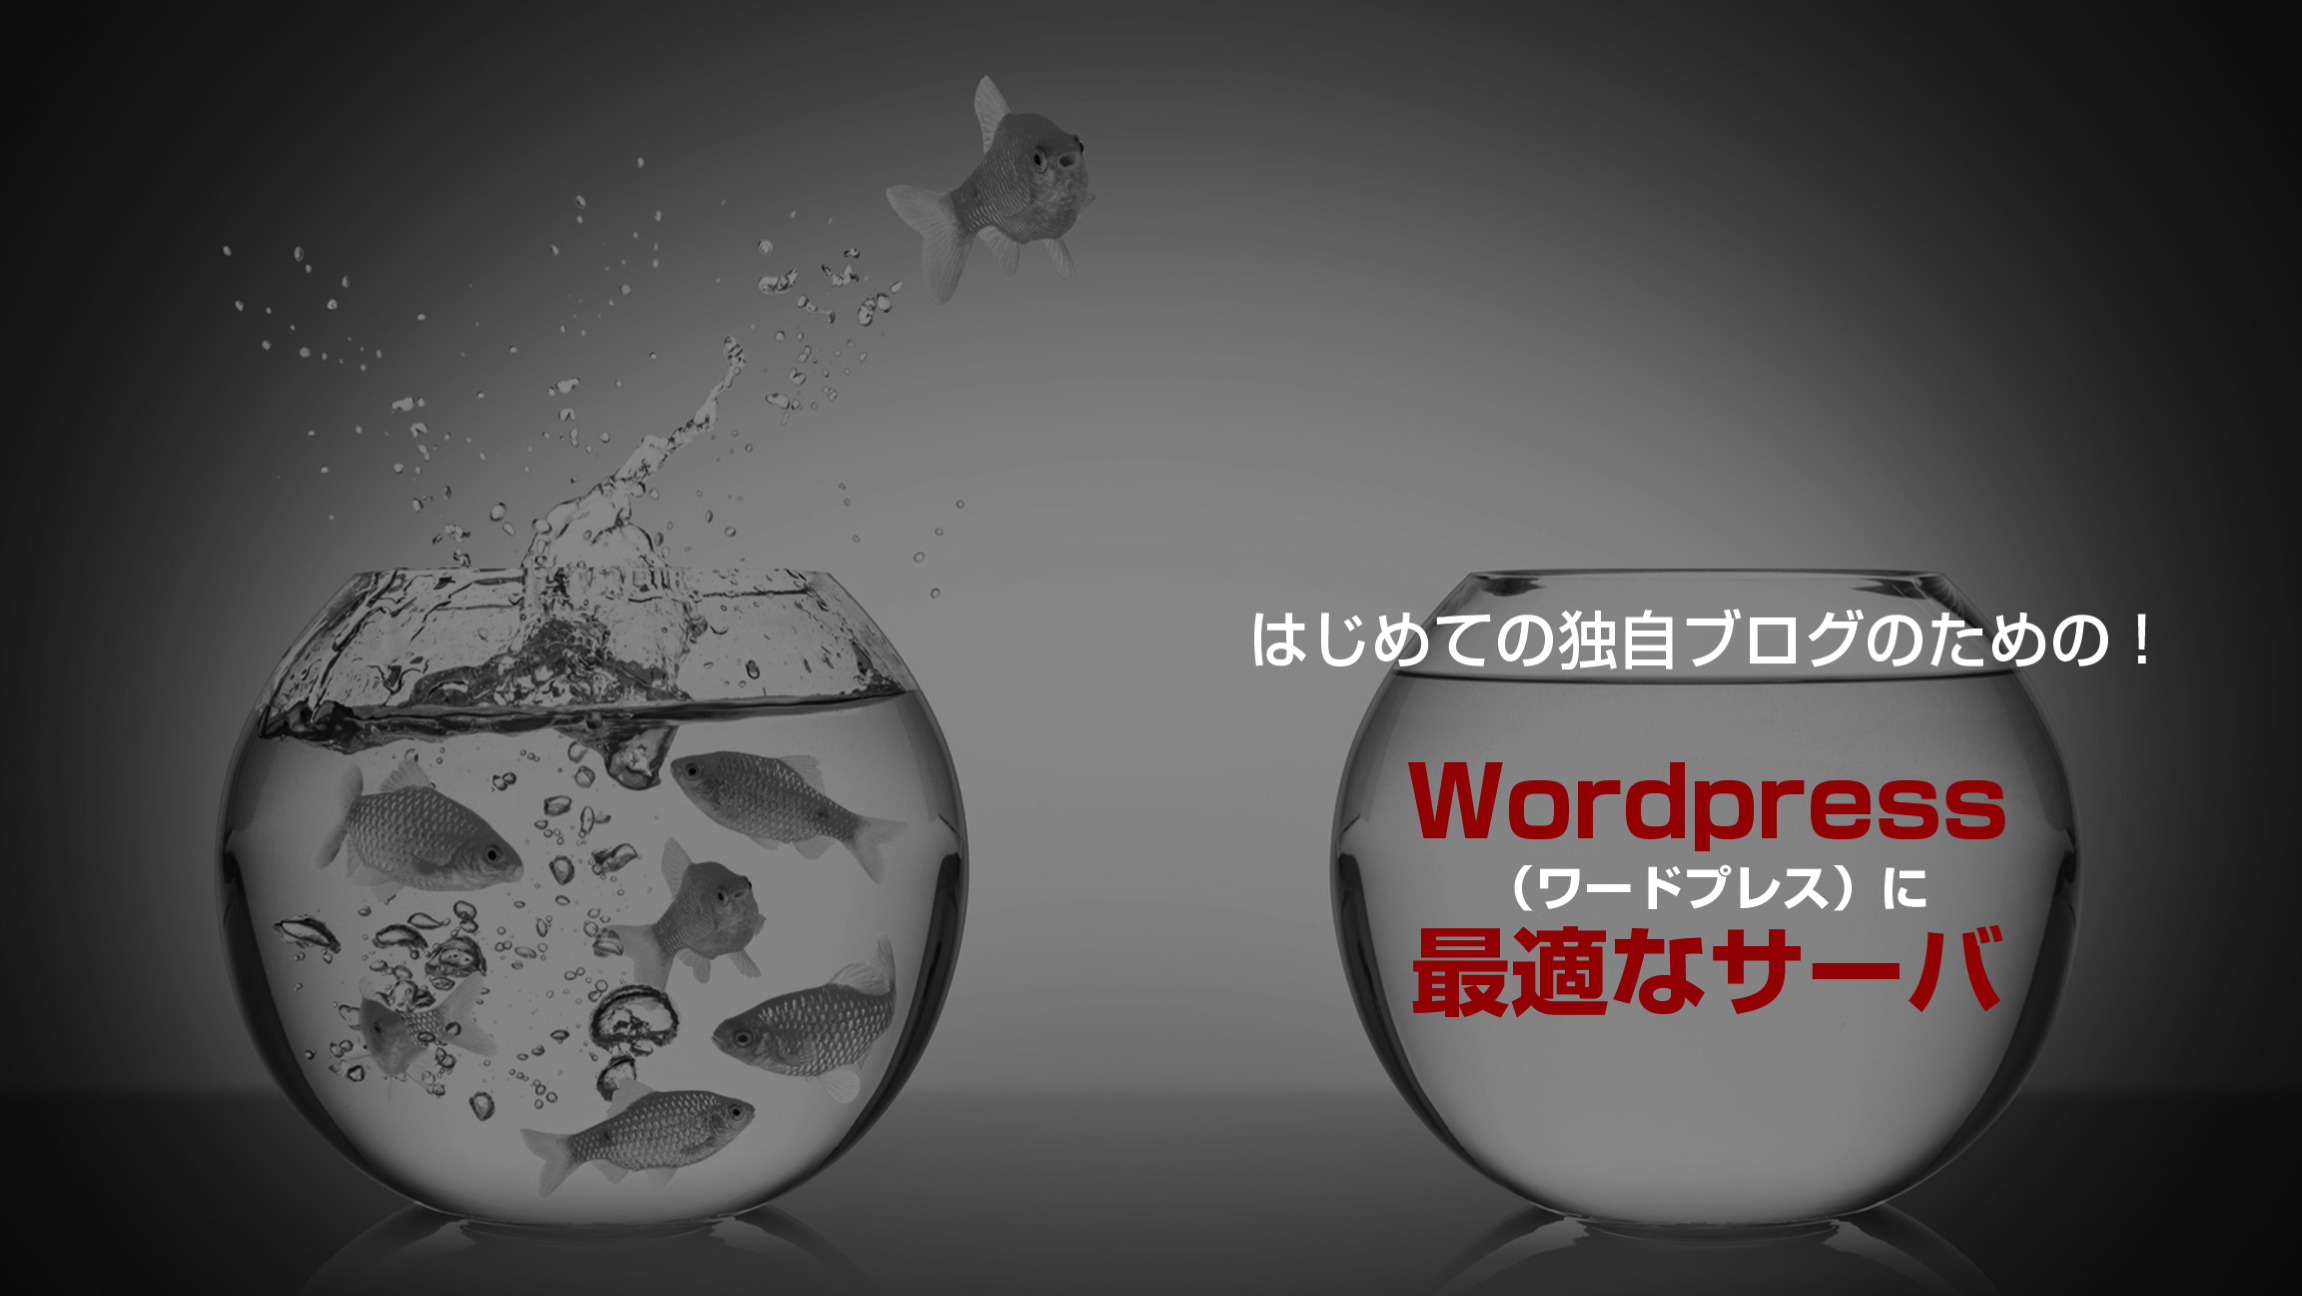 Wordpress(ワードプレス)に最適なサーバ.png